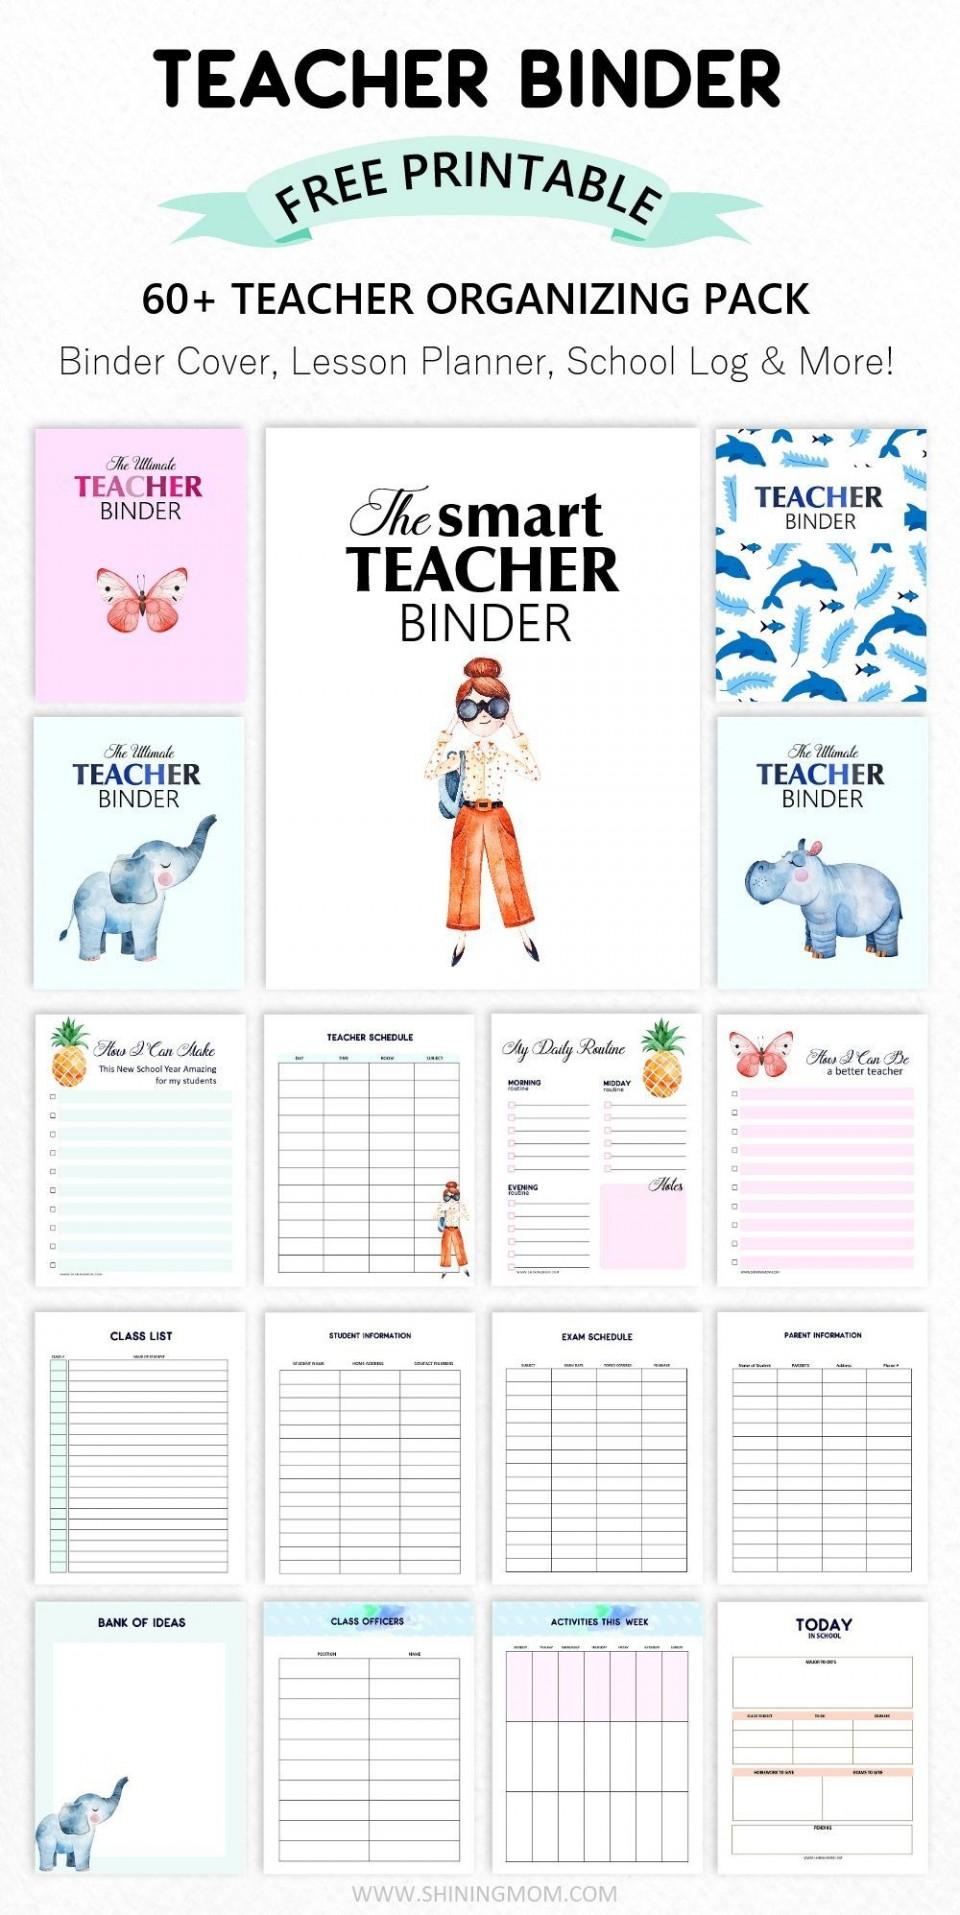 003 Formidable Free Printable Teacher Binder Template High Resolution 960